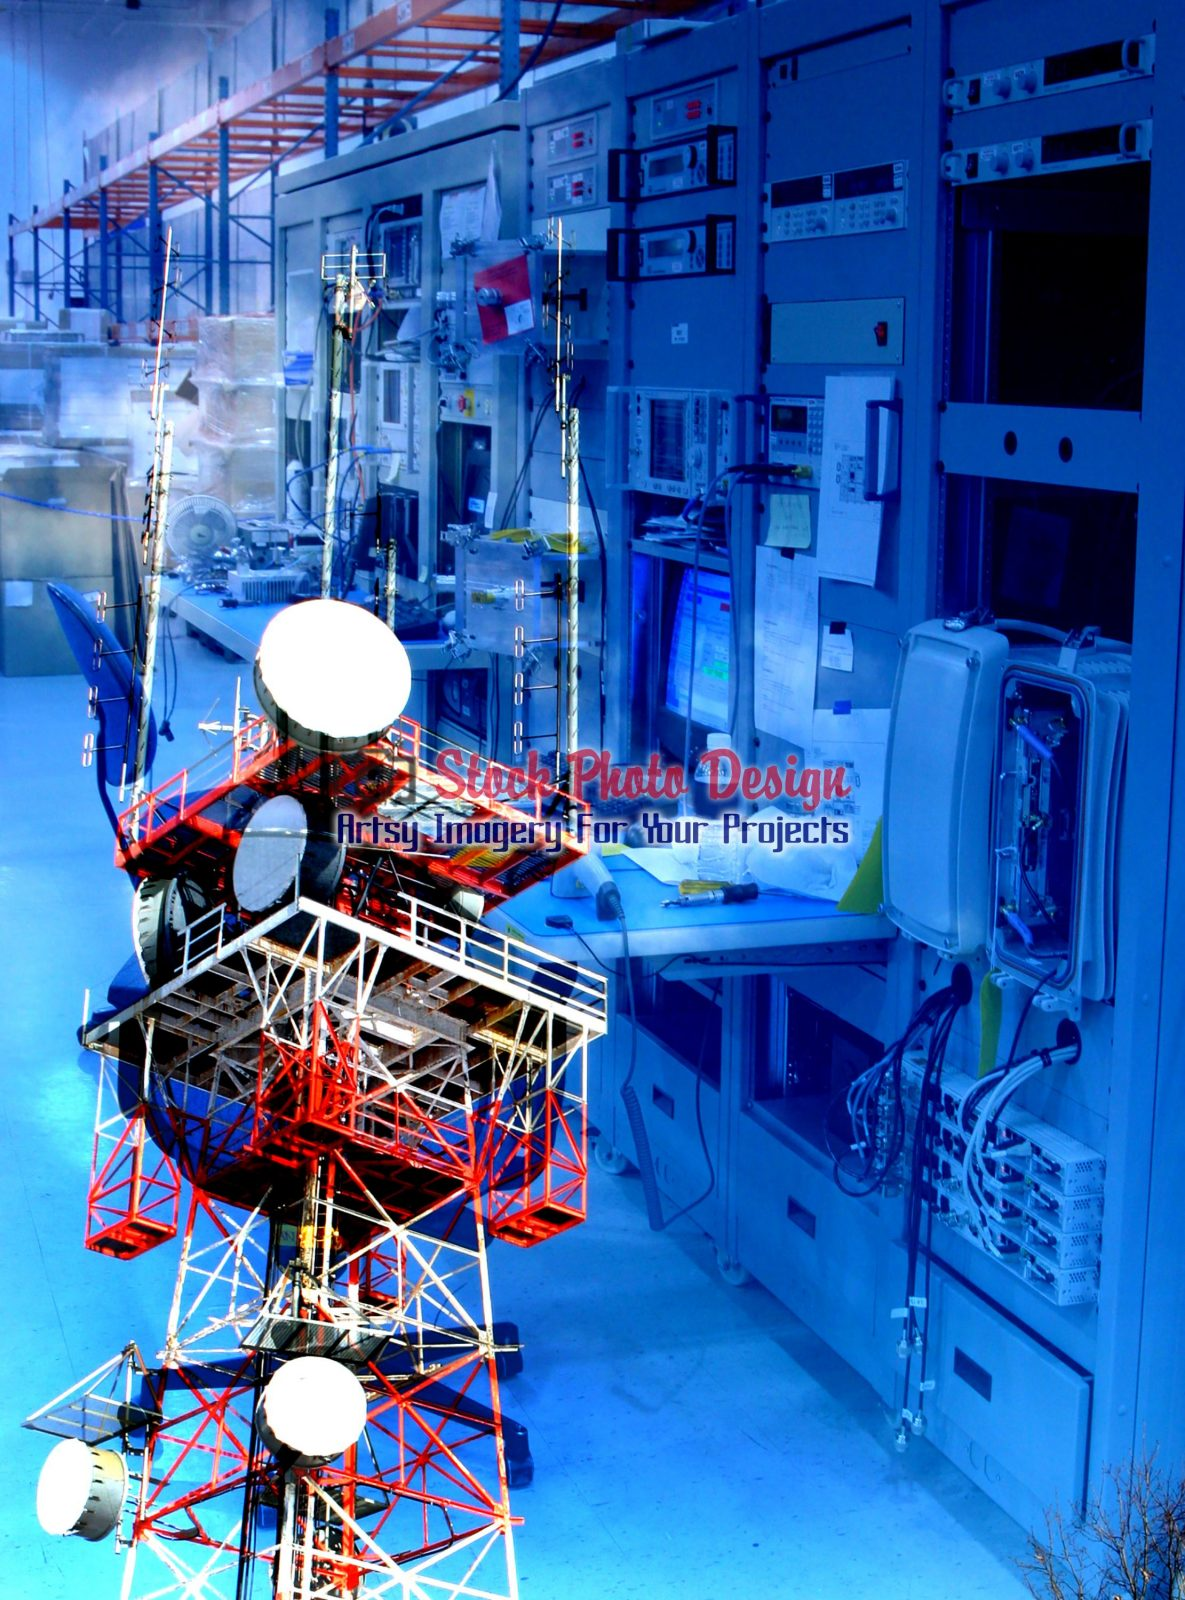 Modern-Communication-Equipments-Photo-Montage-Image